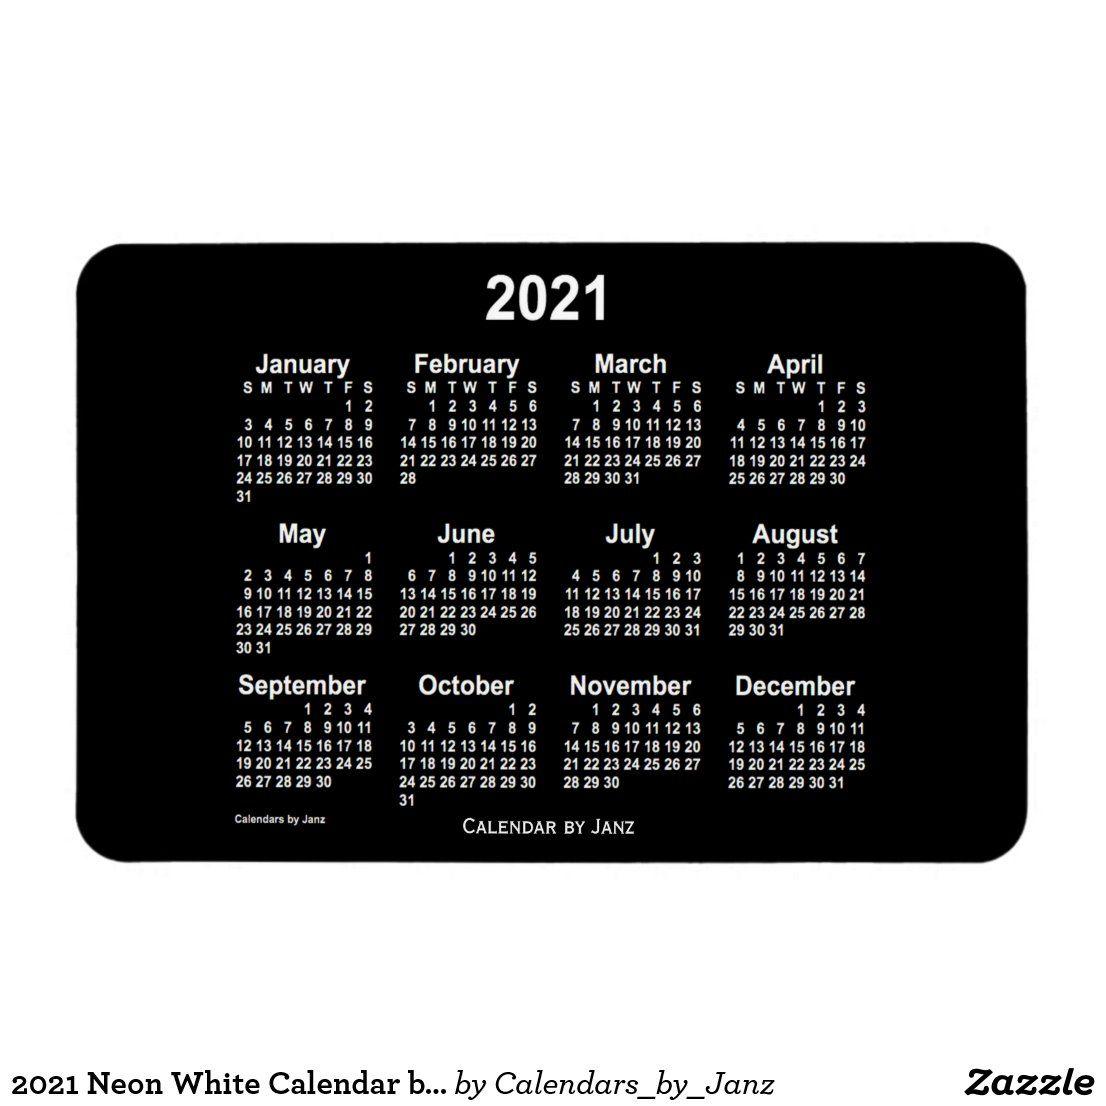 2021 Neon White Calendar by Janz 4x6